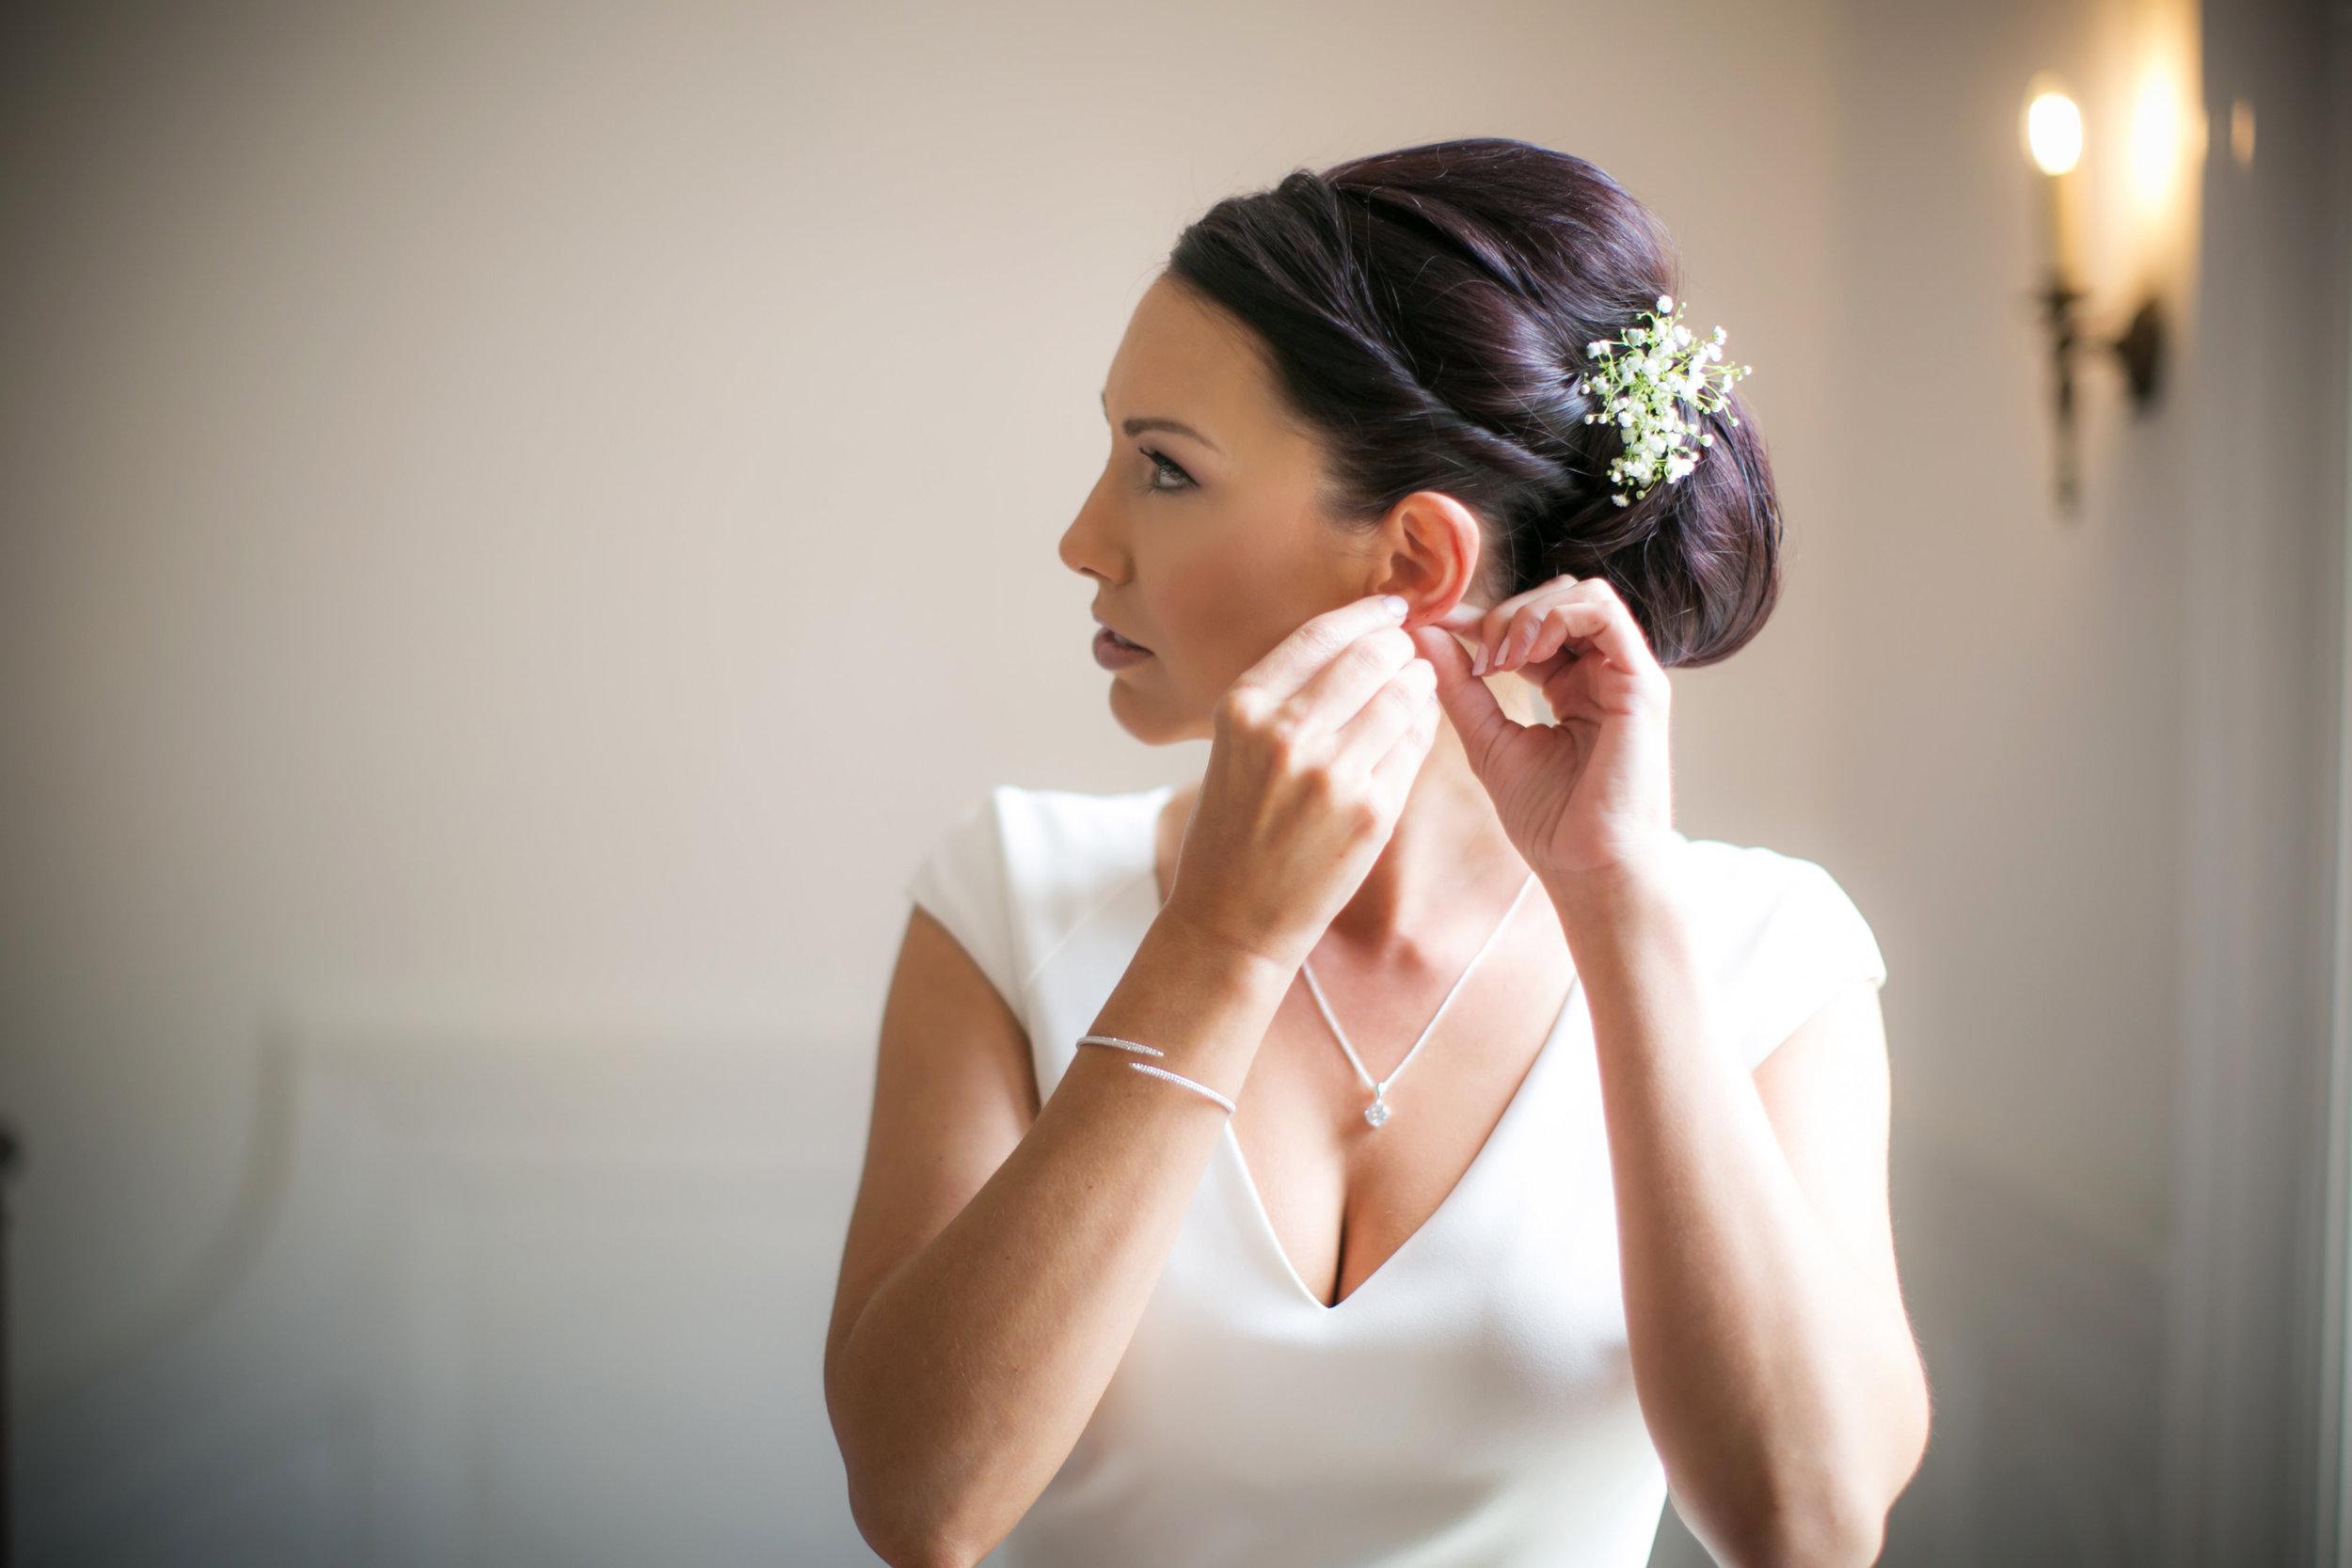 Pure elegance events Tynise Kee dc wedding planner va wedding planner rust manor house leesburg -0007.jpg